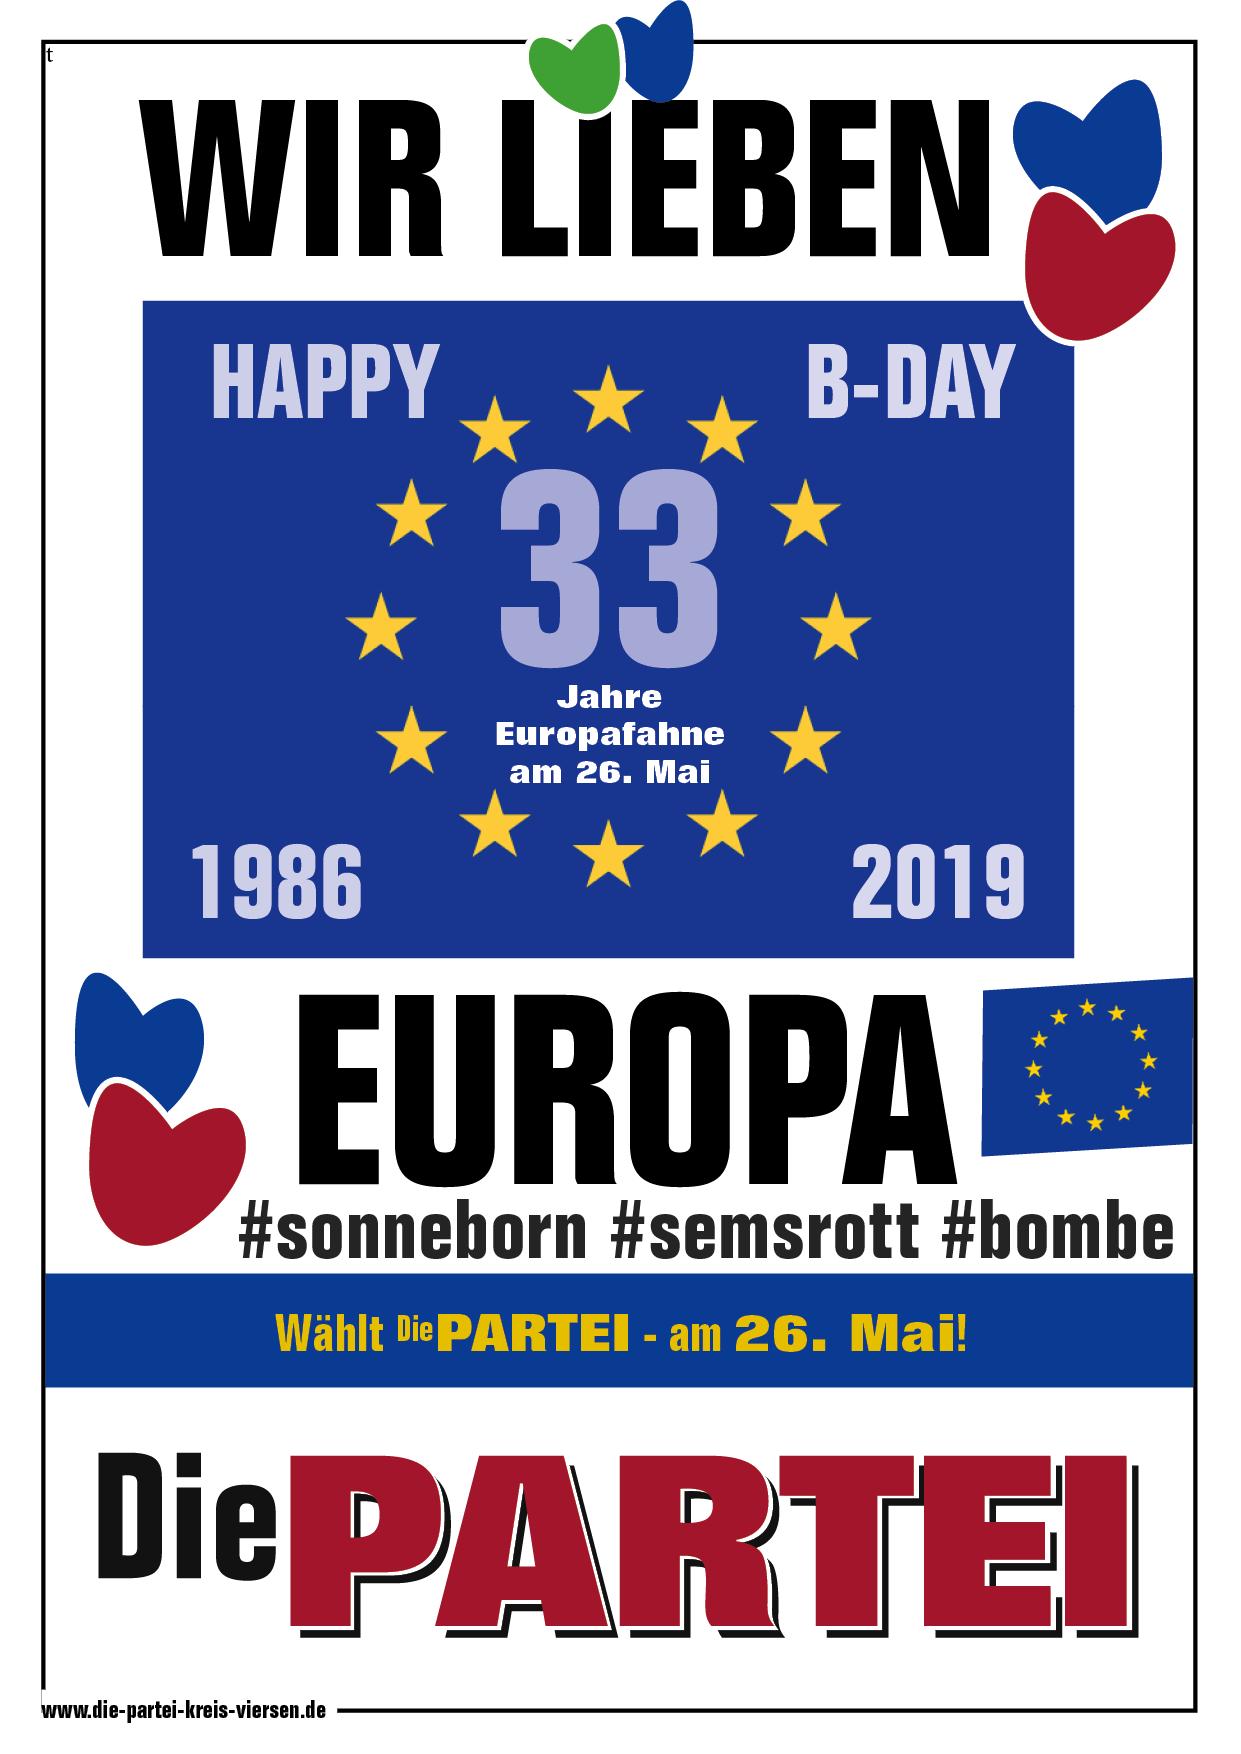 33 Jahre EU-Flagge am 26. Mai. 2019